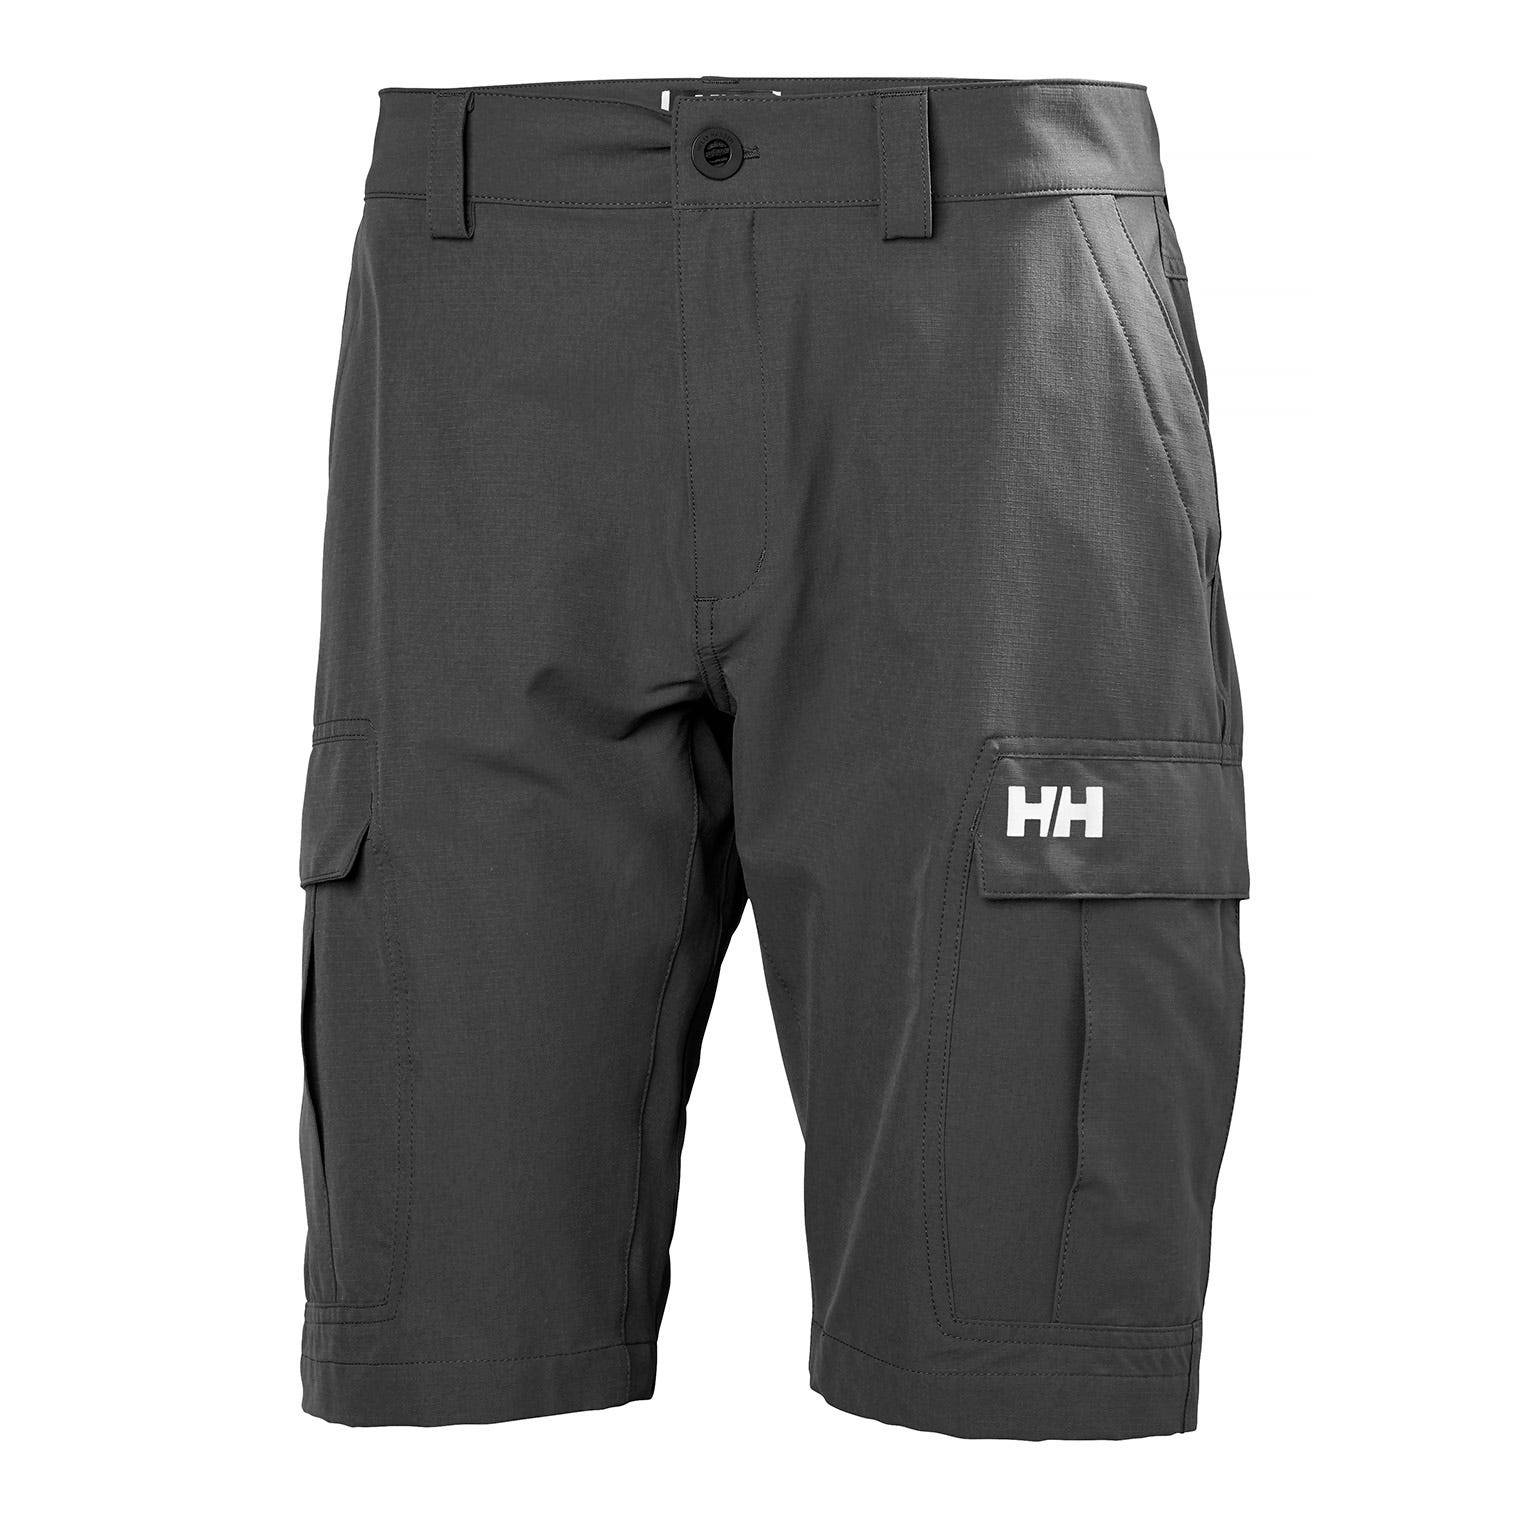 Helly Hansen Qd Cargo Shorts 11 Mens Sailing Pant Black 32